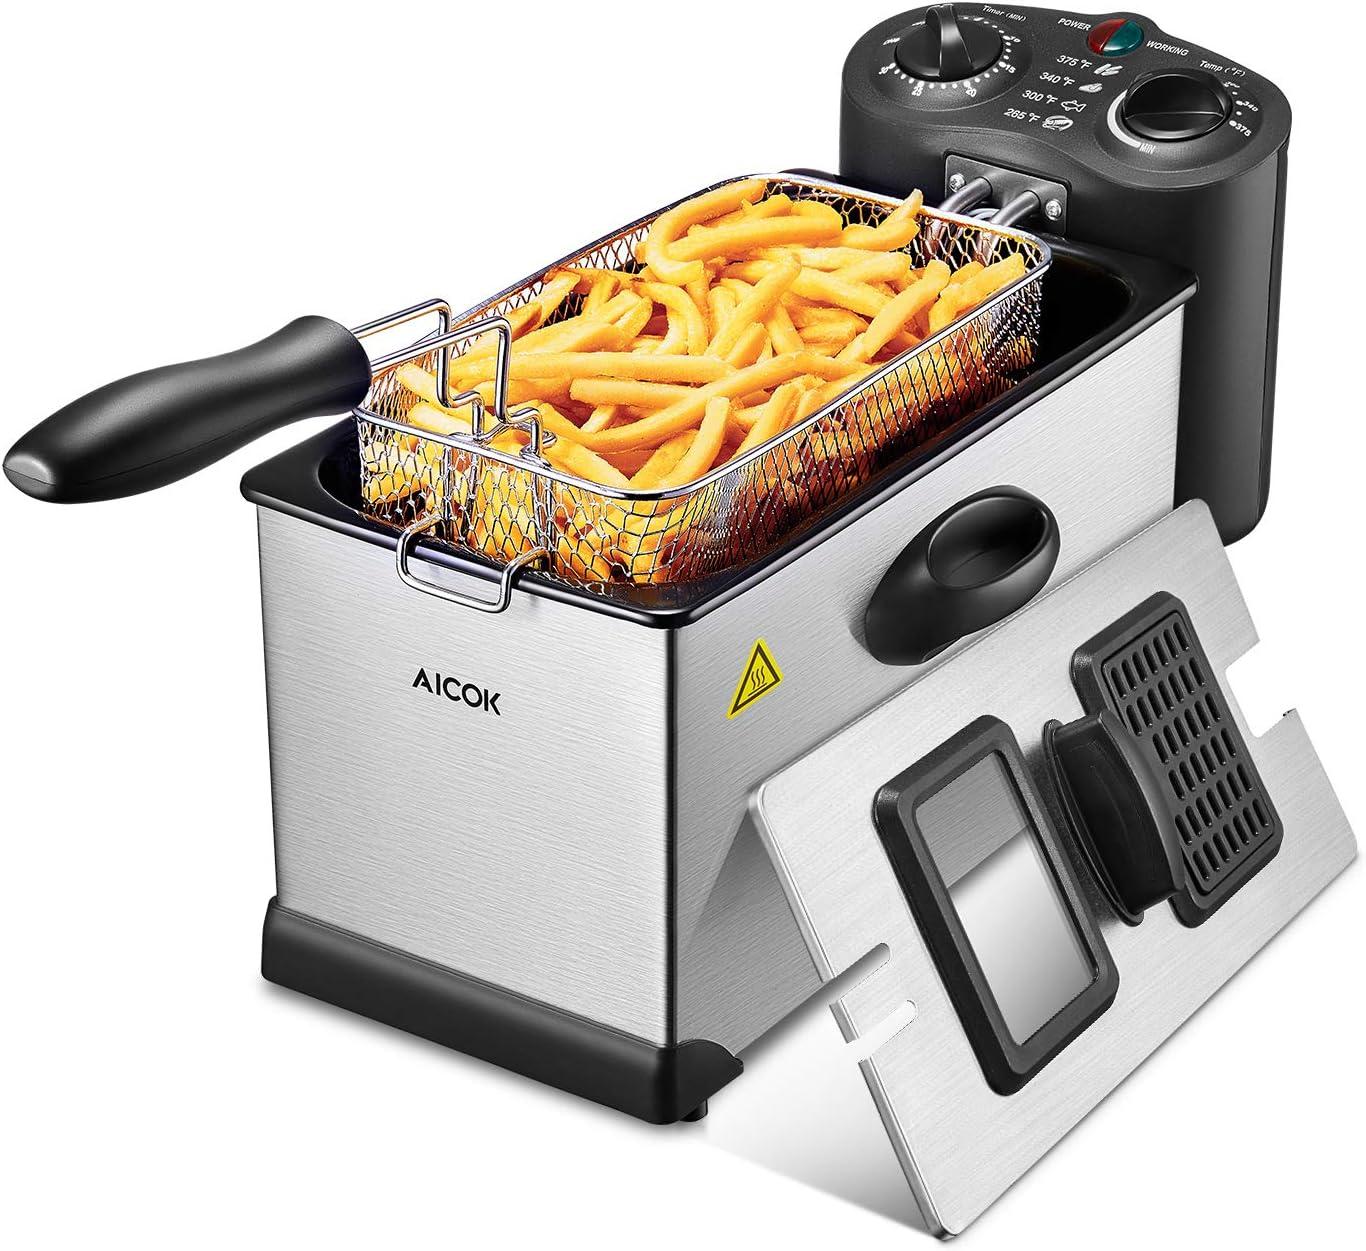 Aicok - Best deep fryer